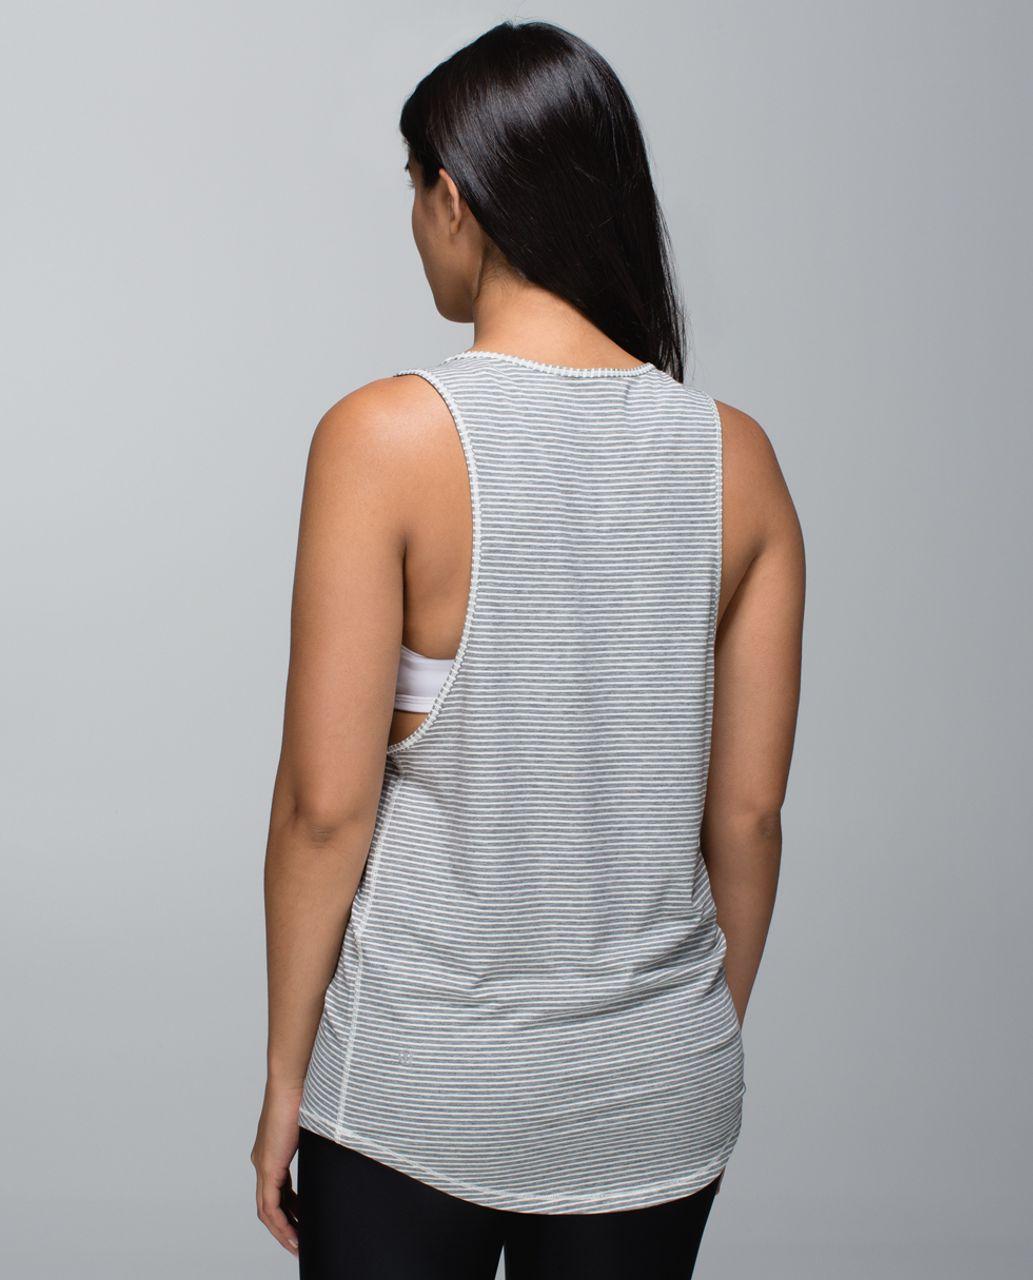 Lululemon Ravi Tank - Hyper Stripe Heathered Medium Grey Ghost